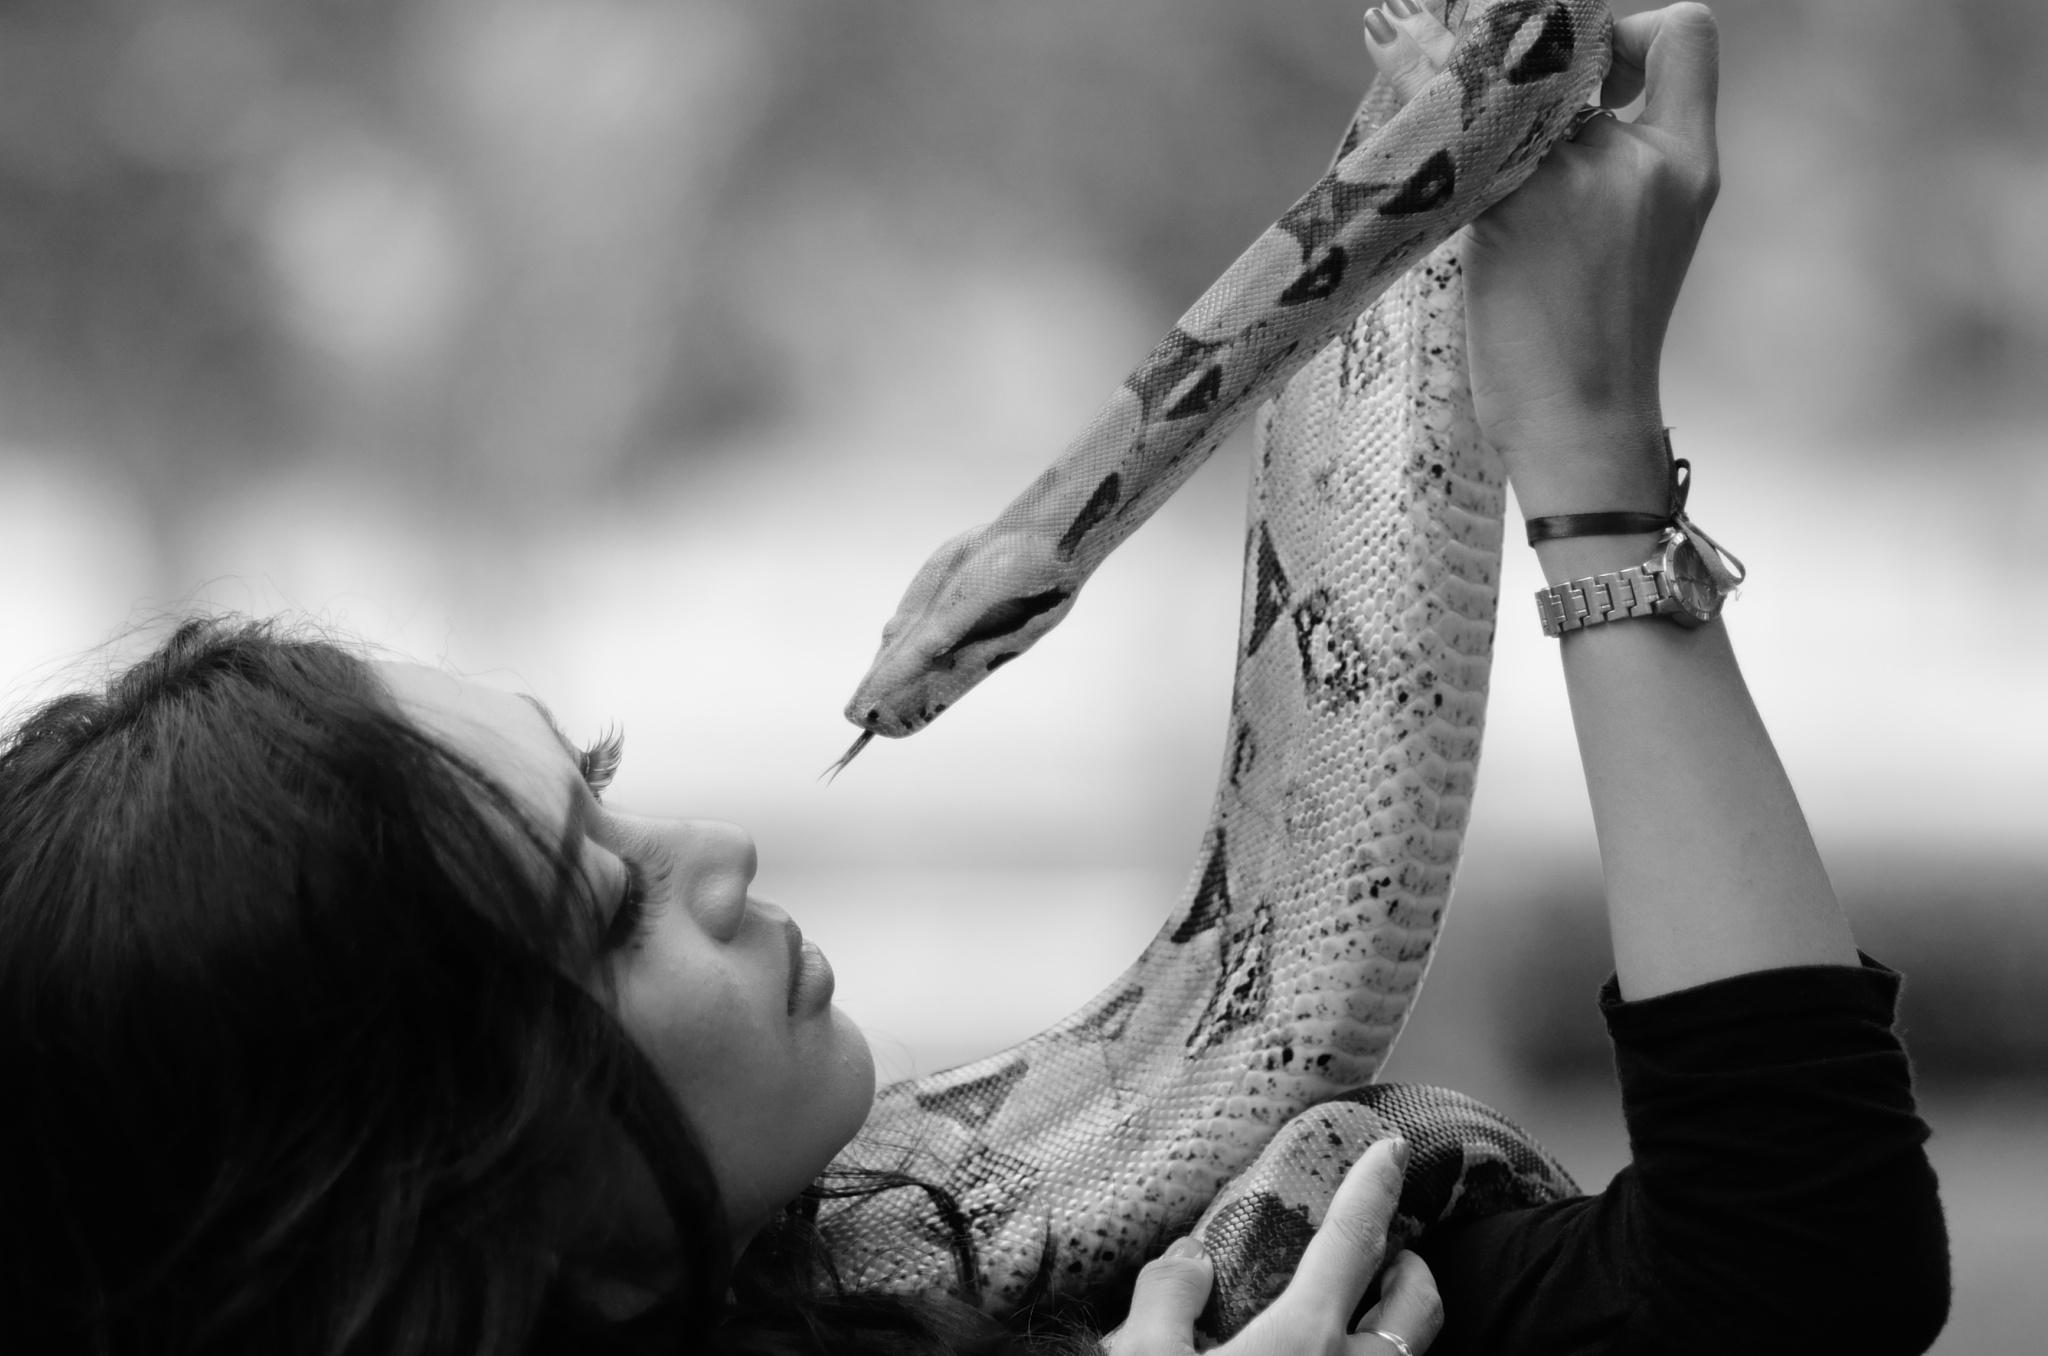 Snake Charmer by Yulius B Susilo